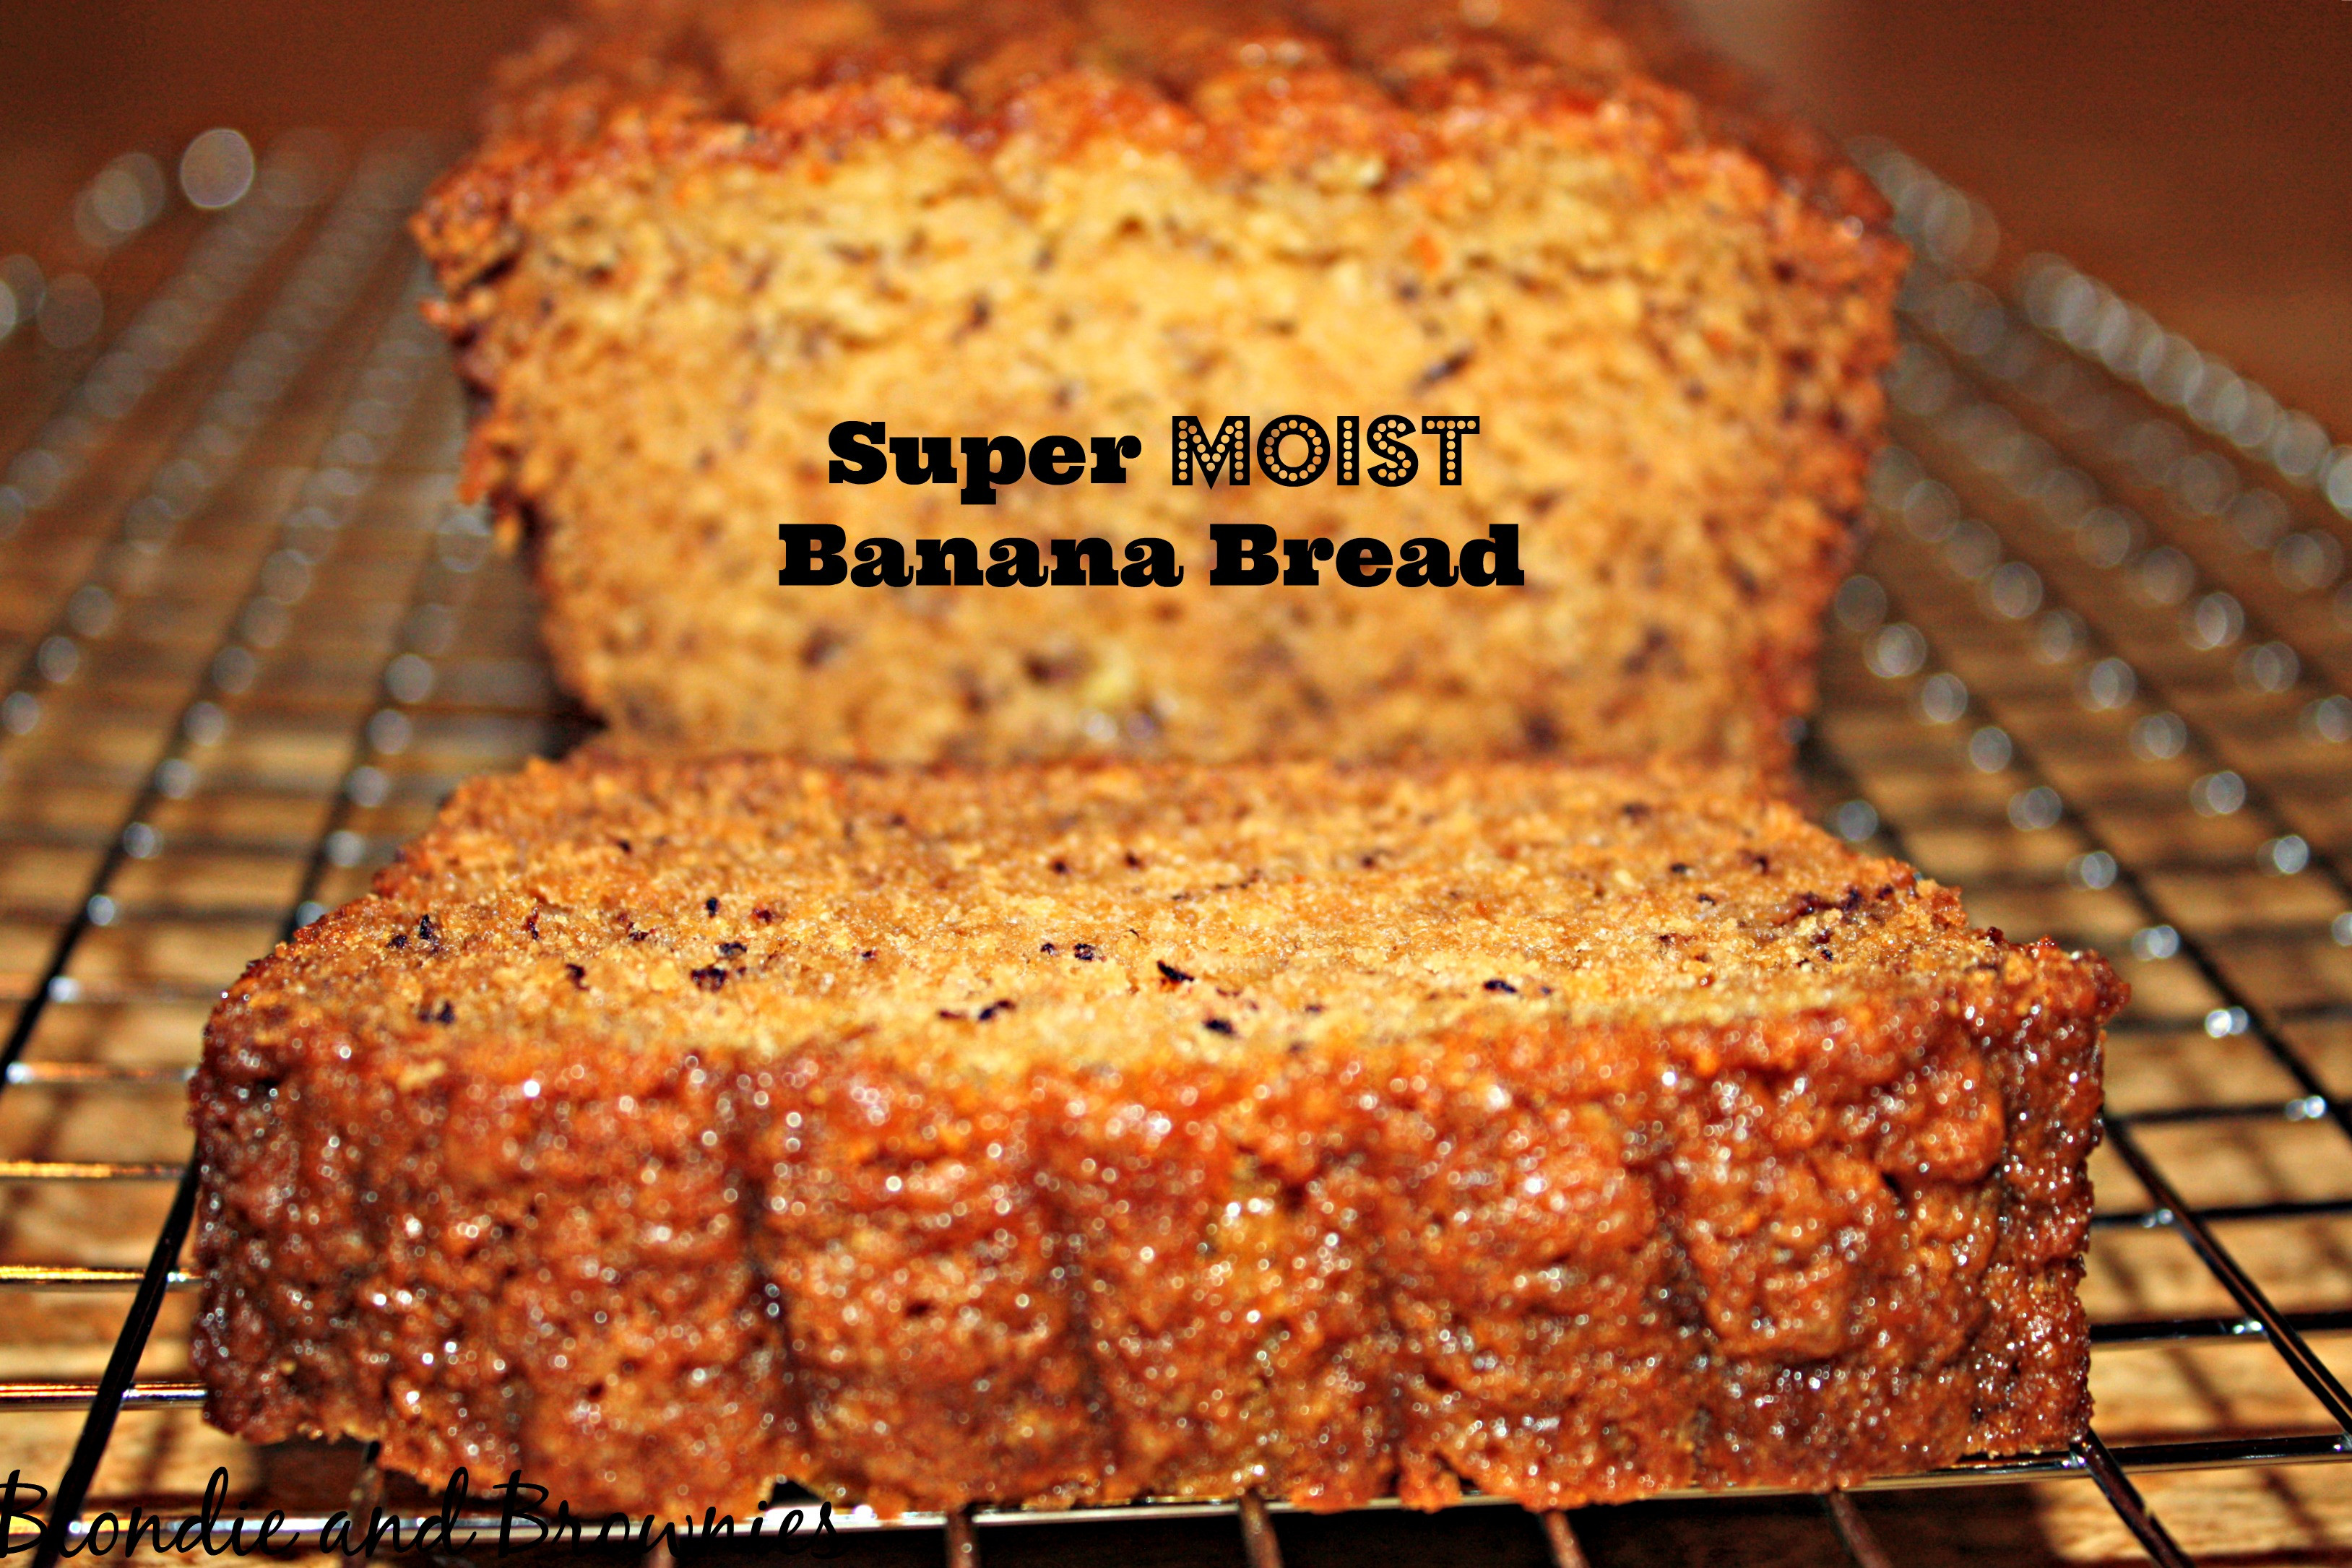 Super Moist Banana Bread Recipe  Super Moist Banana Bread – Blon and Brownies